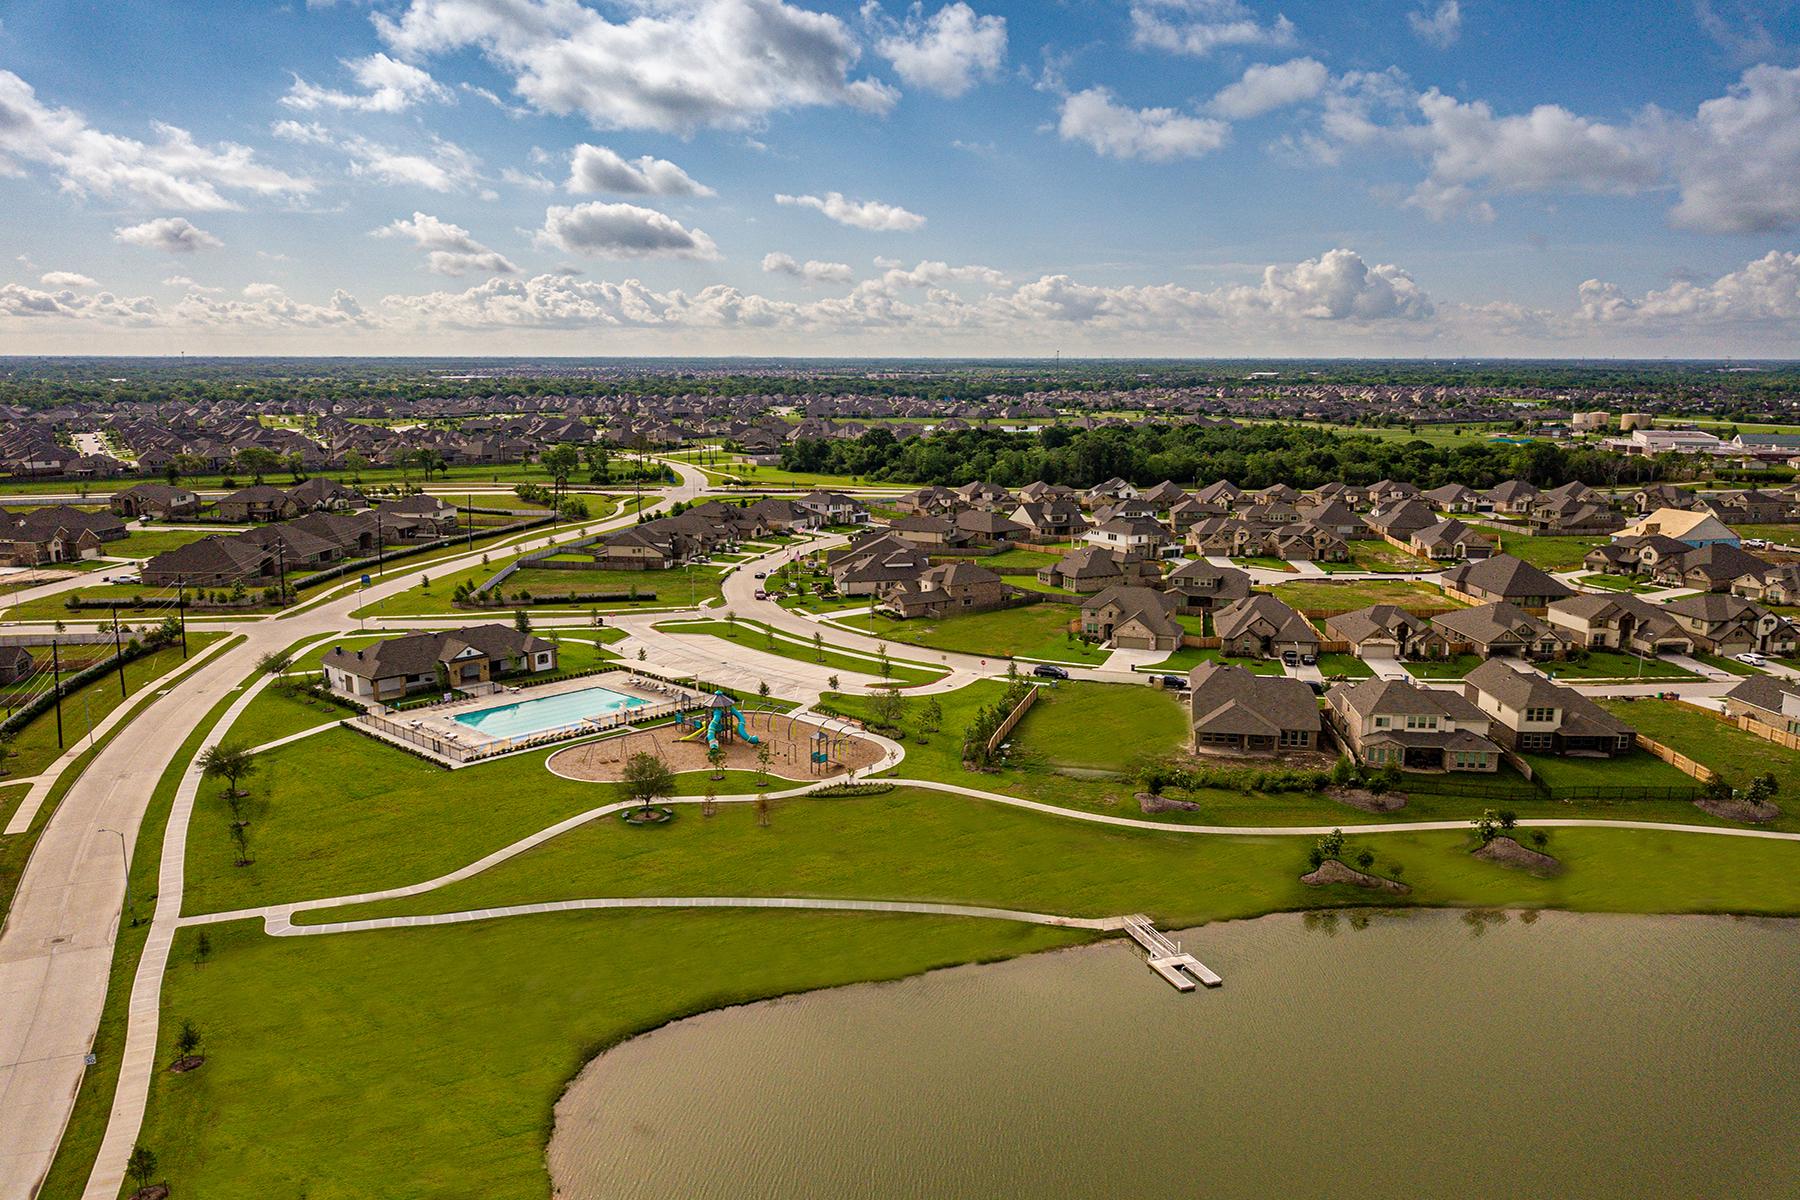 Lakes of Savannah Recreation Center